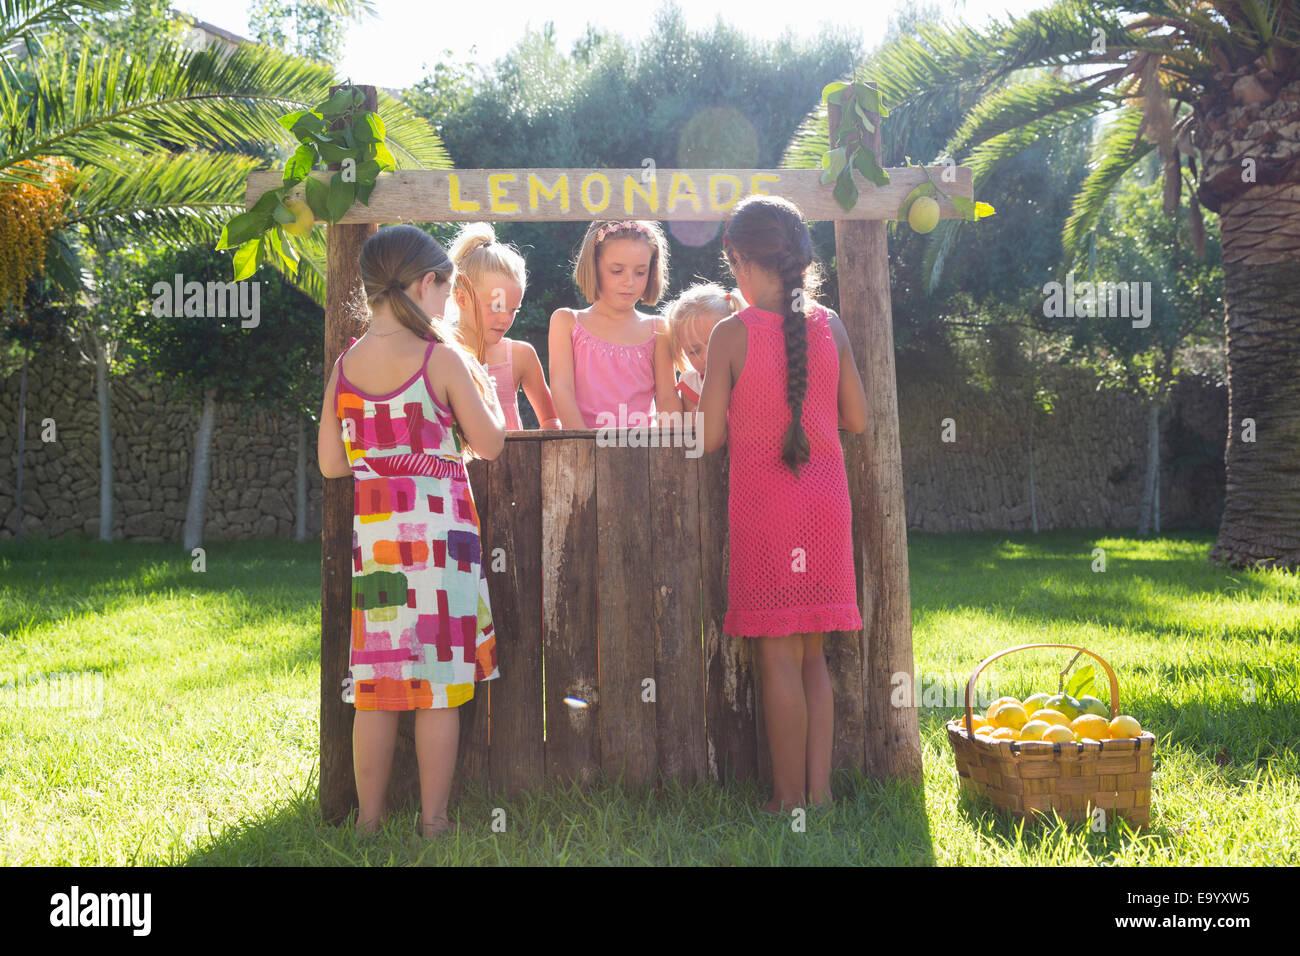 Five girls buying and selling fresh lemonade at lemonade stand in park - Stock Image